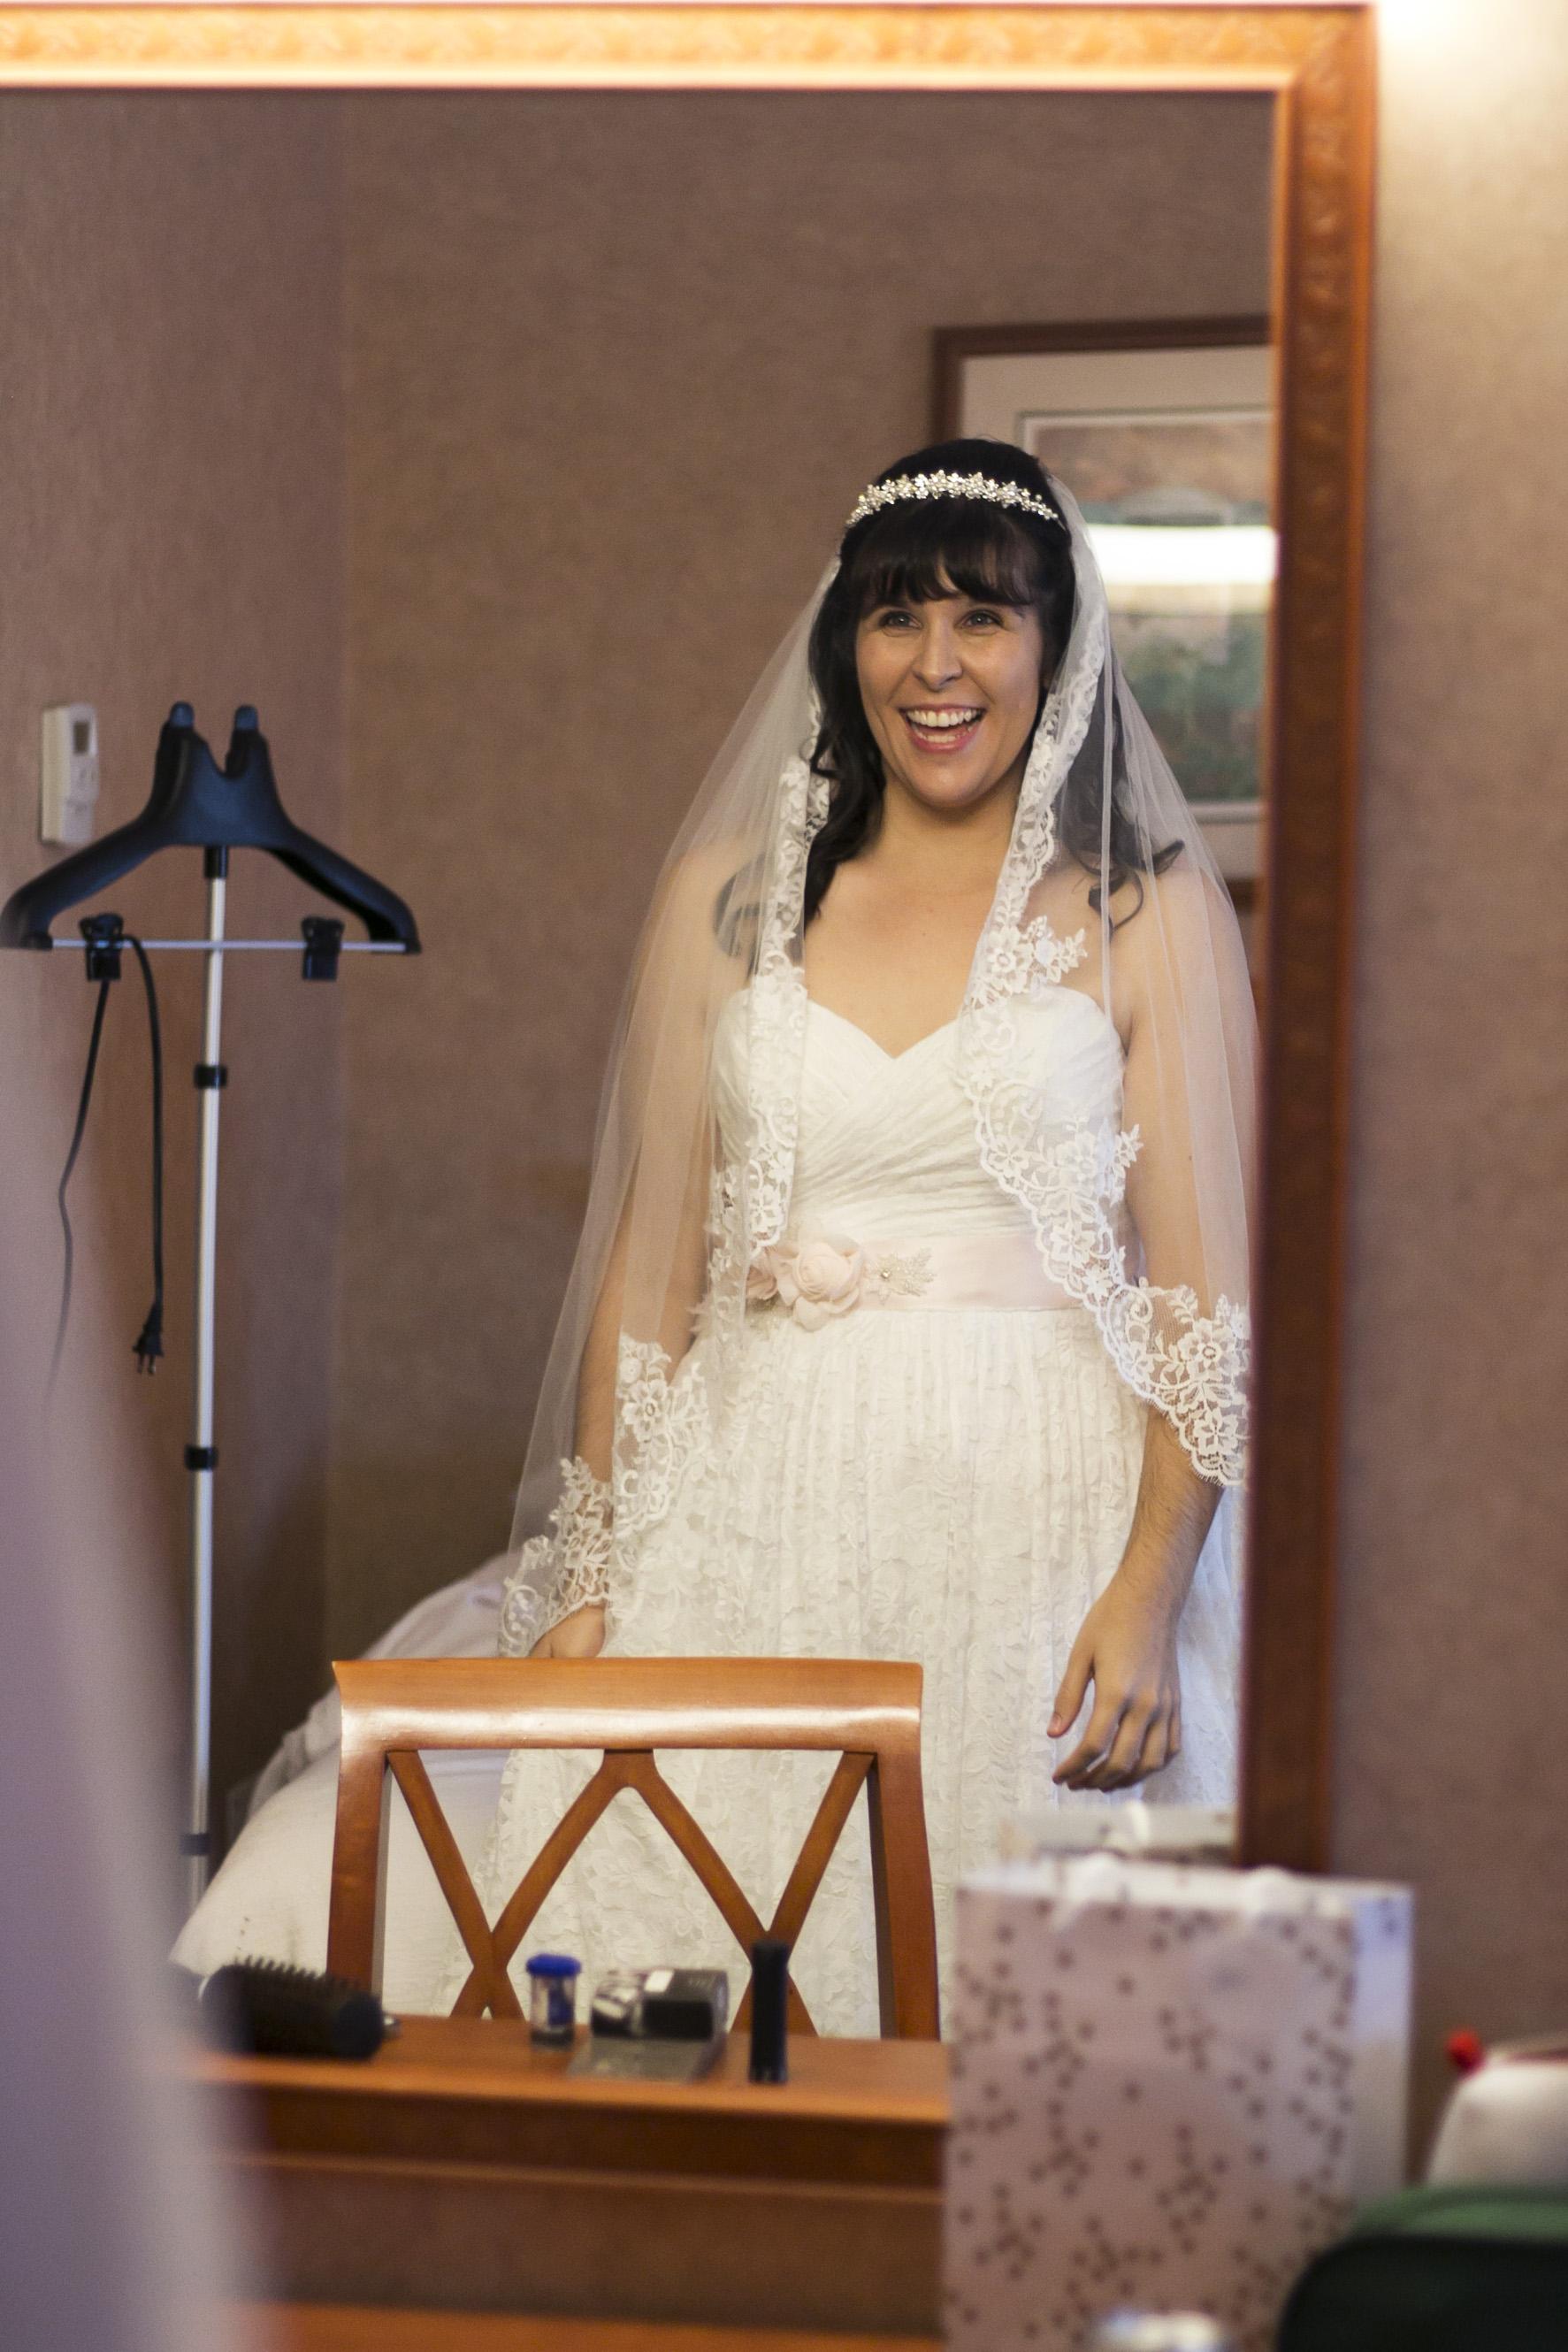 Bride Alisha sees herself in dress